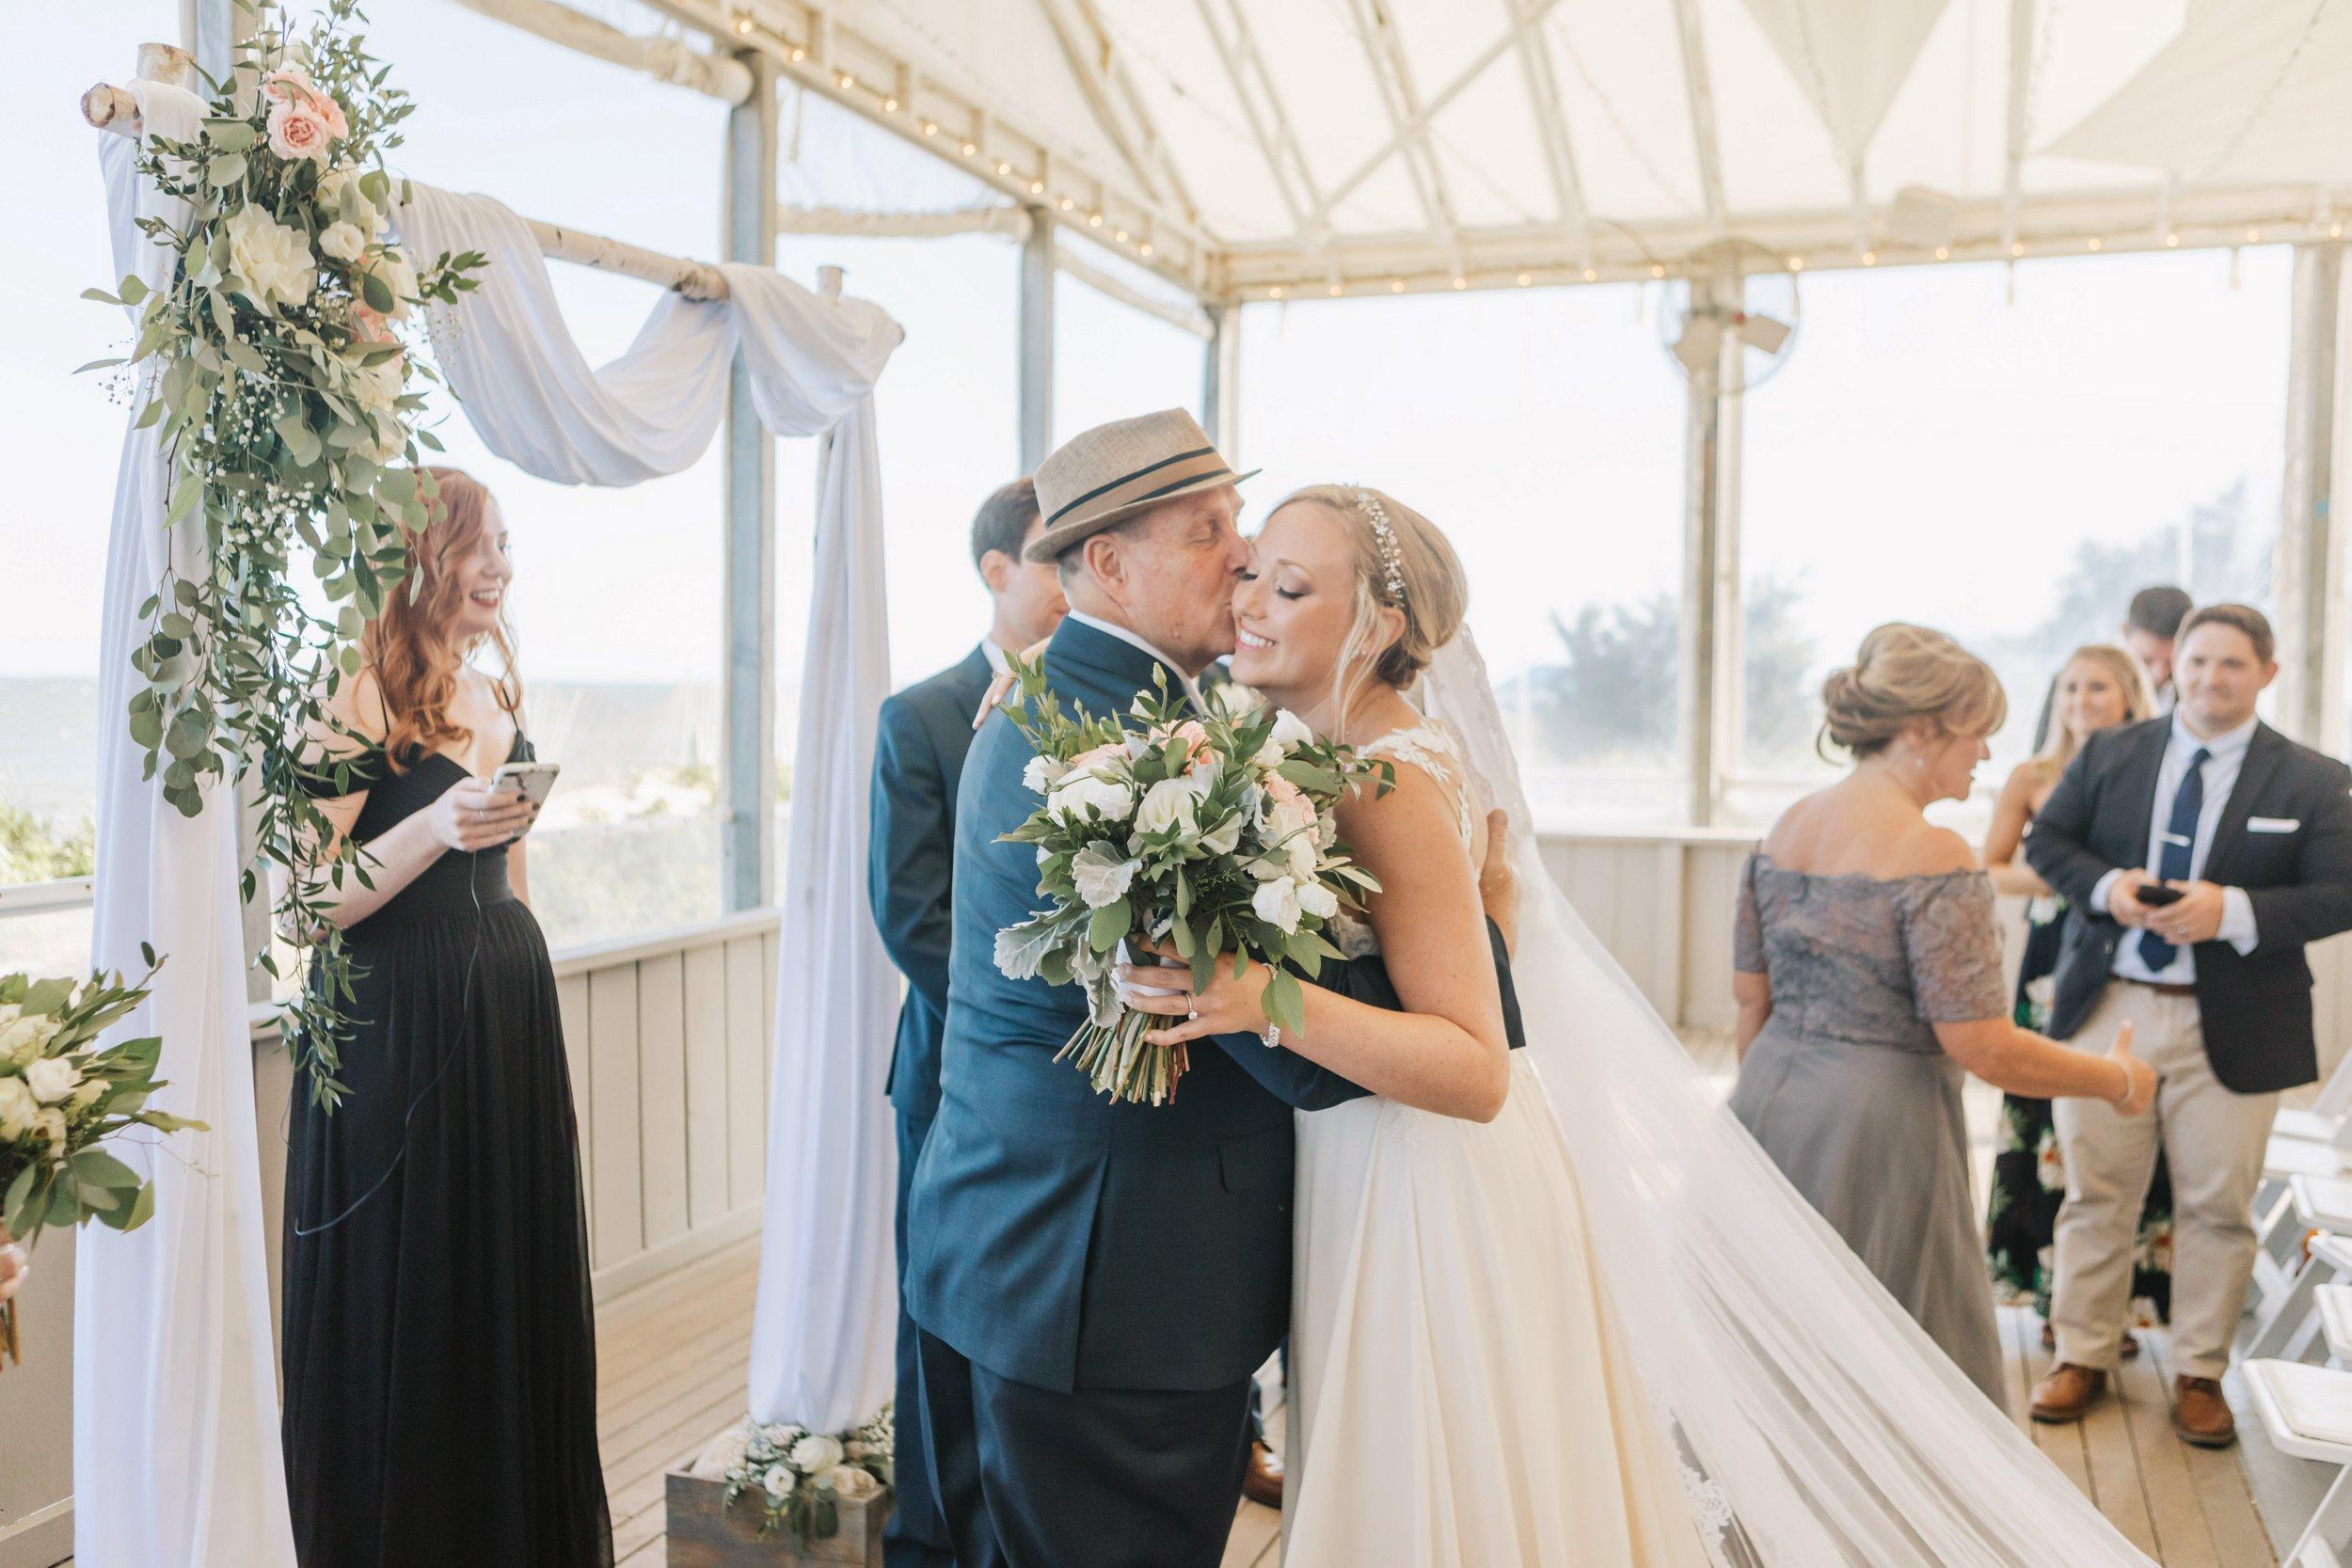 Popponesset-Inn-Wedding-Cape-Cod-Lena-Mirisola-Photography-32.jpg